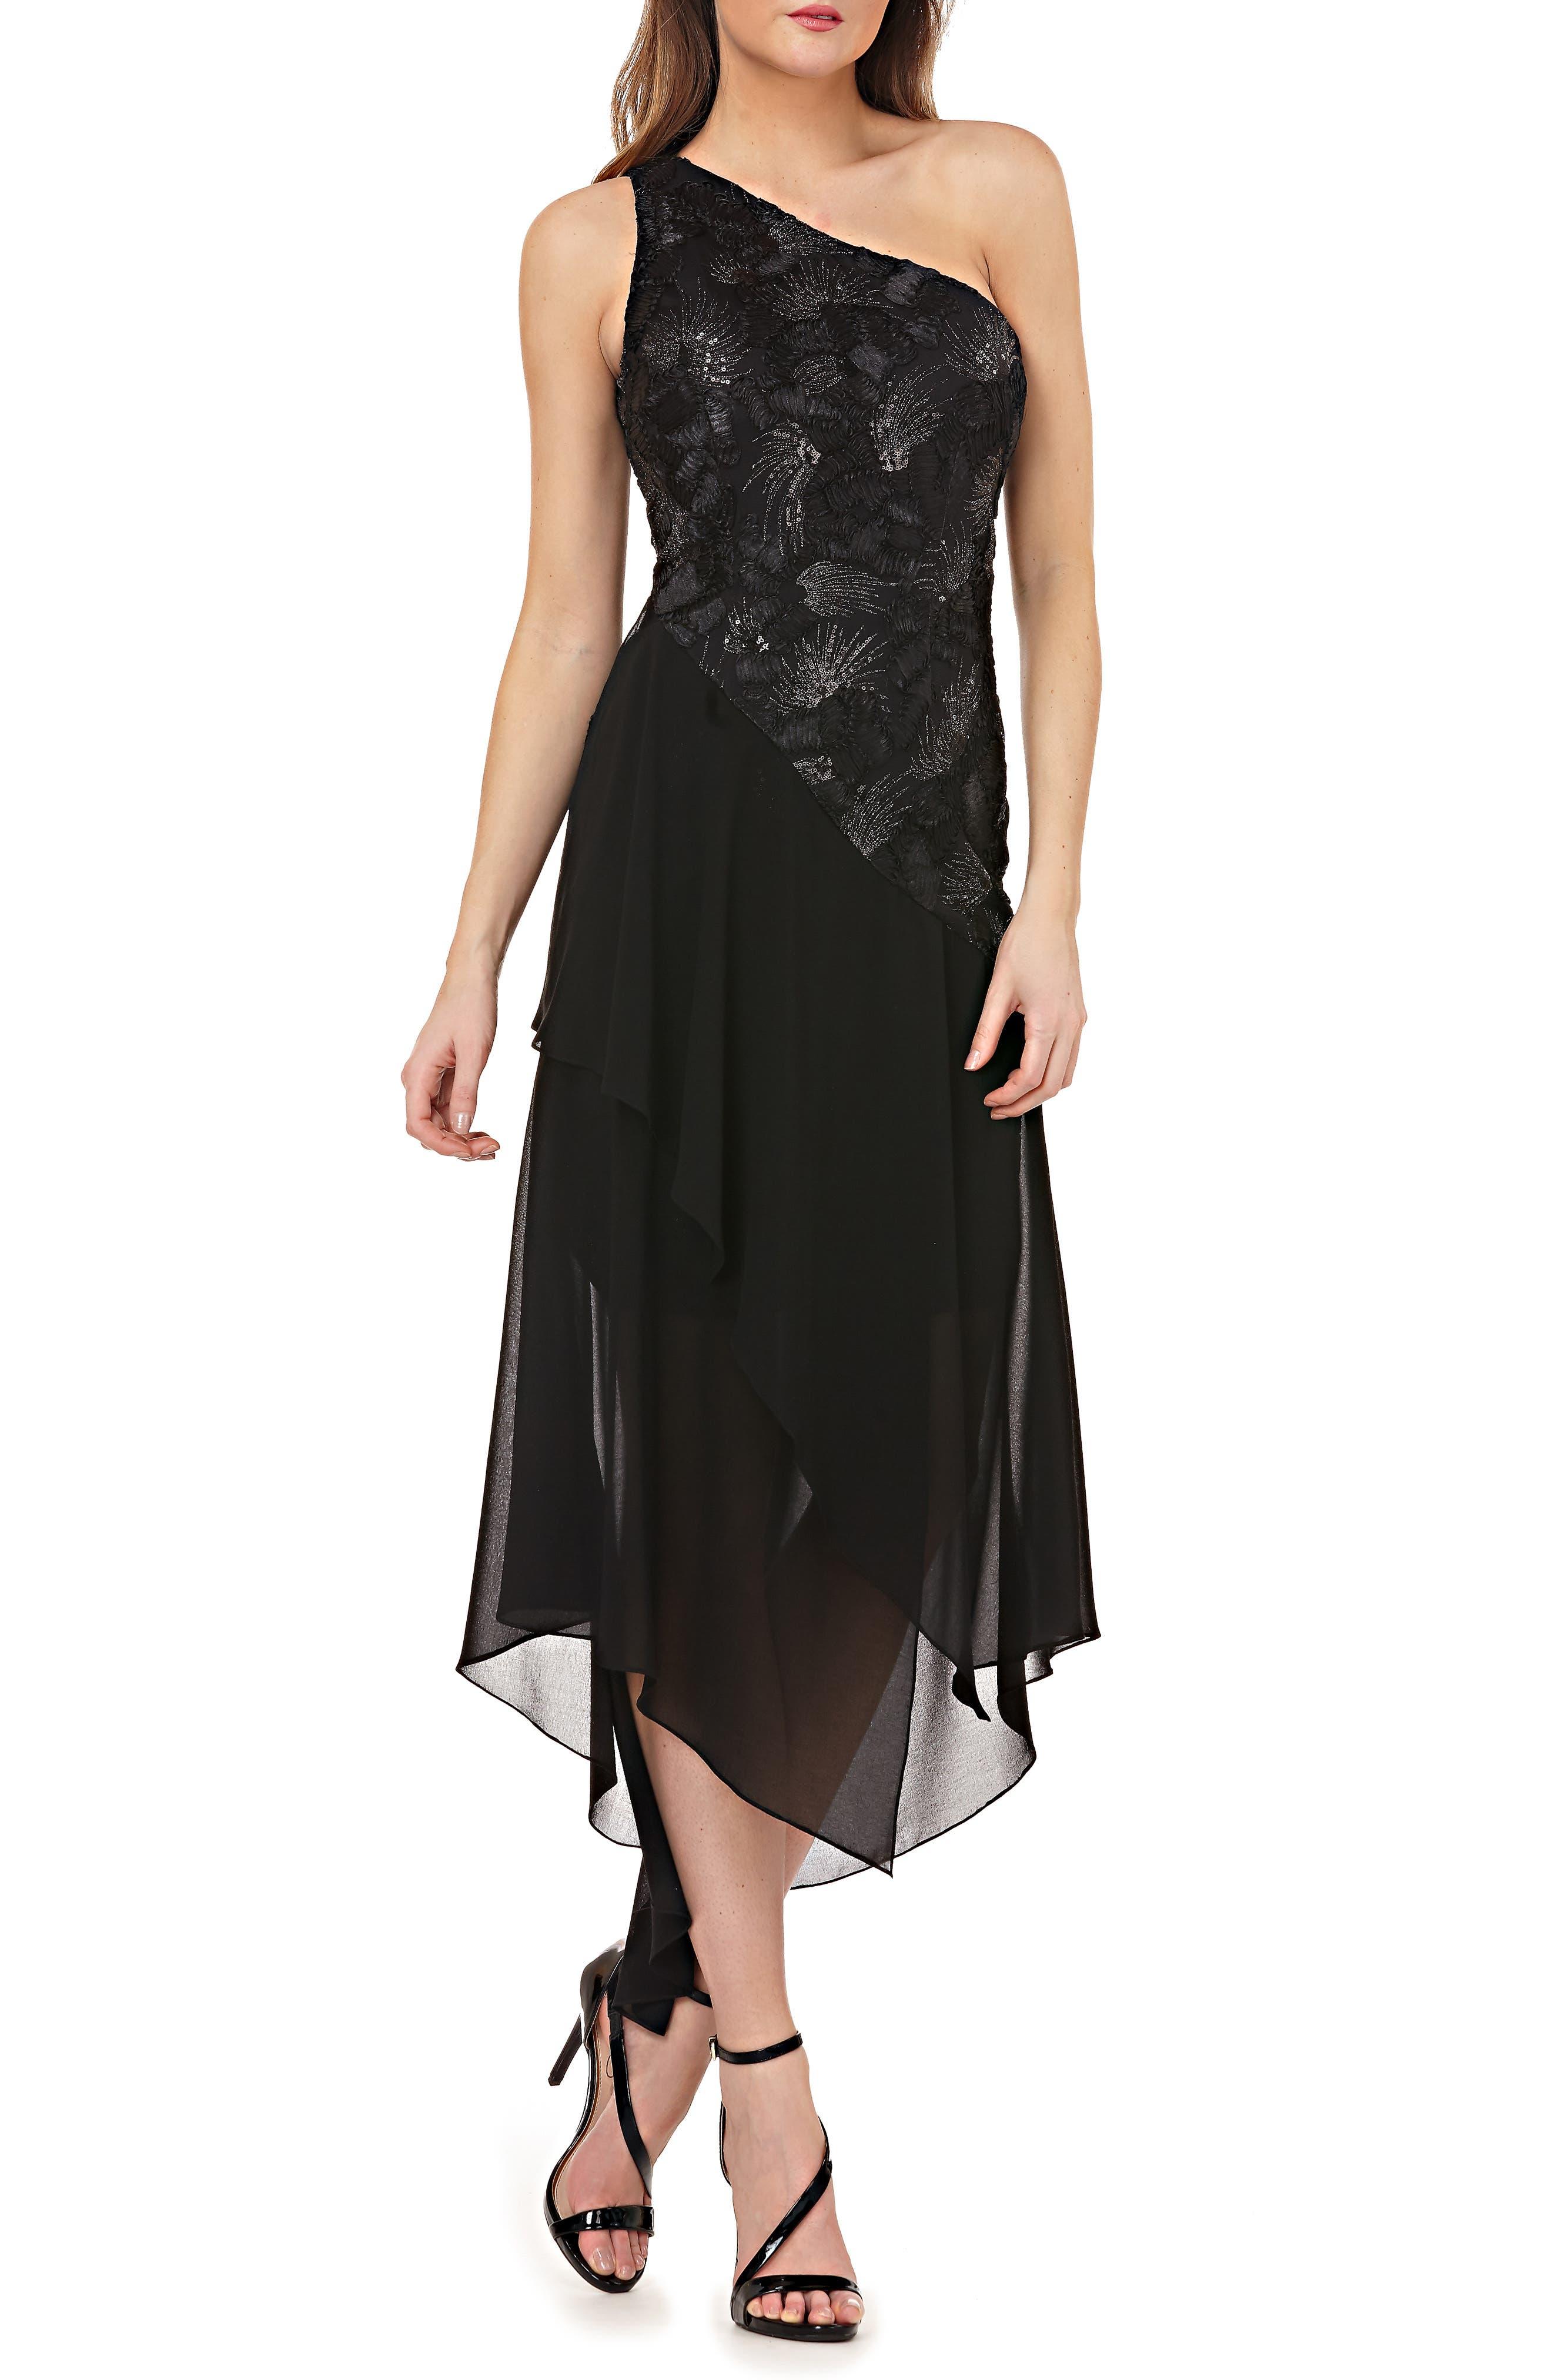 Carmen Marc Valvo Infusion Sequin & Chiffon One-Shoulder Dress, Black